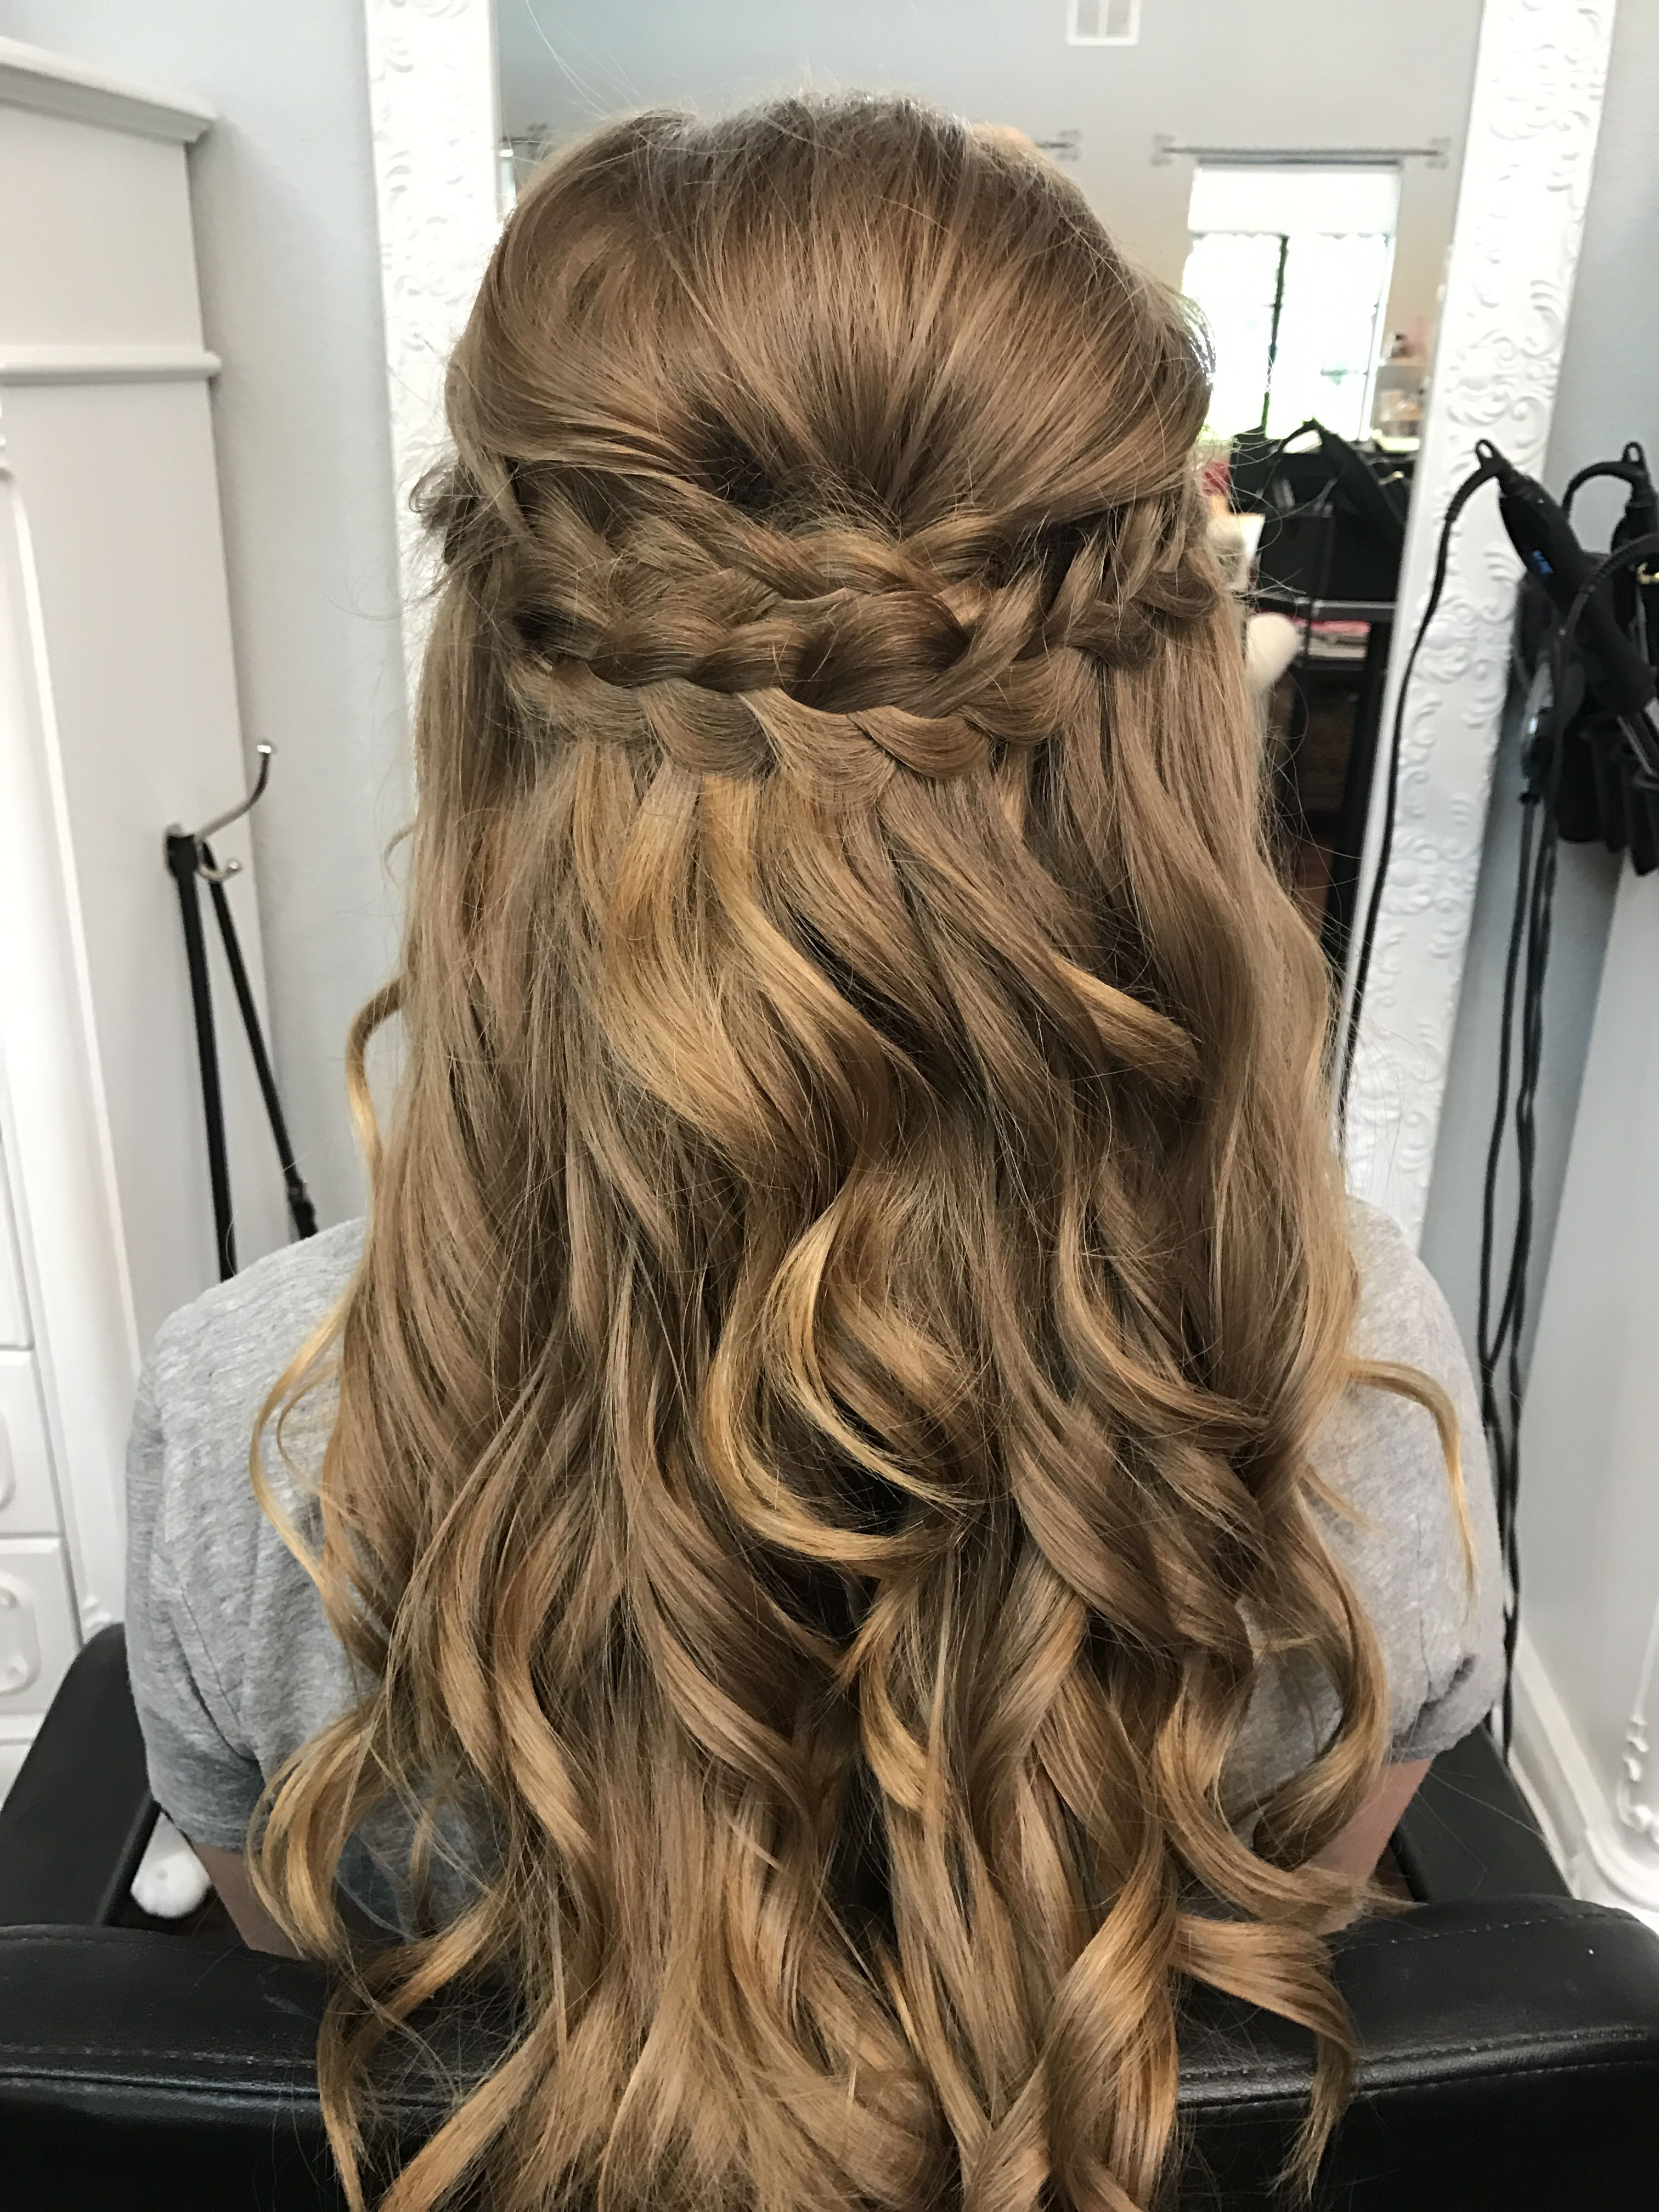 Braided half up half down prom hair hair styles pinterest prom